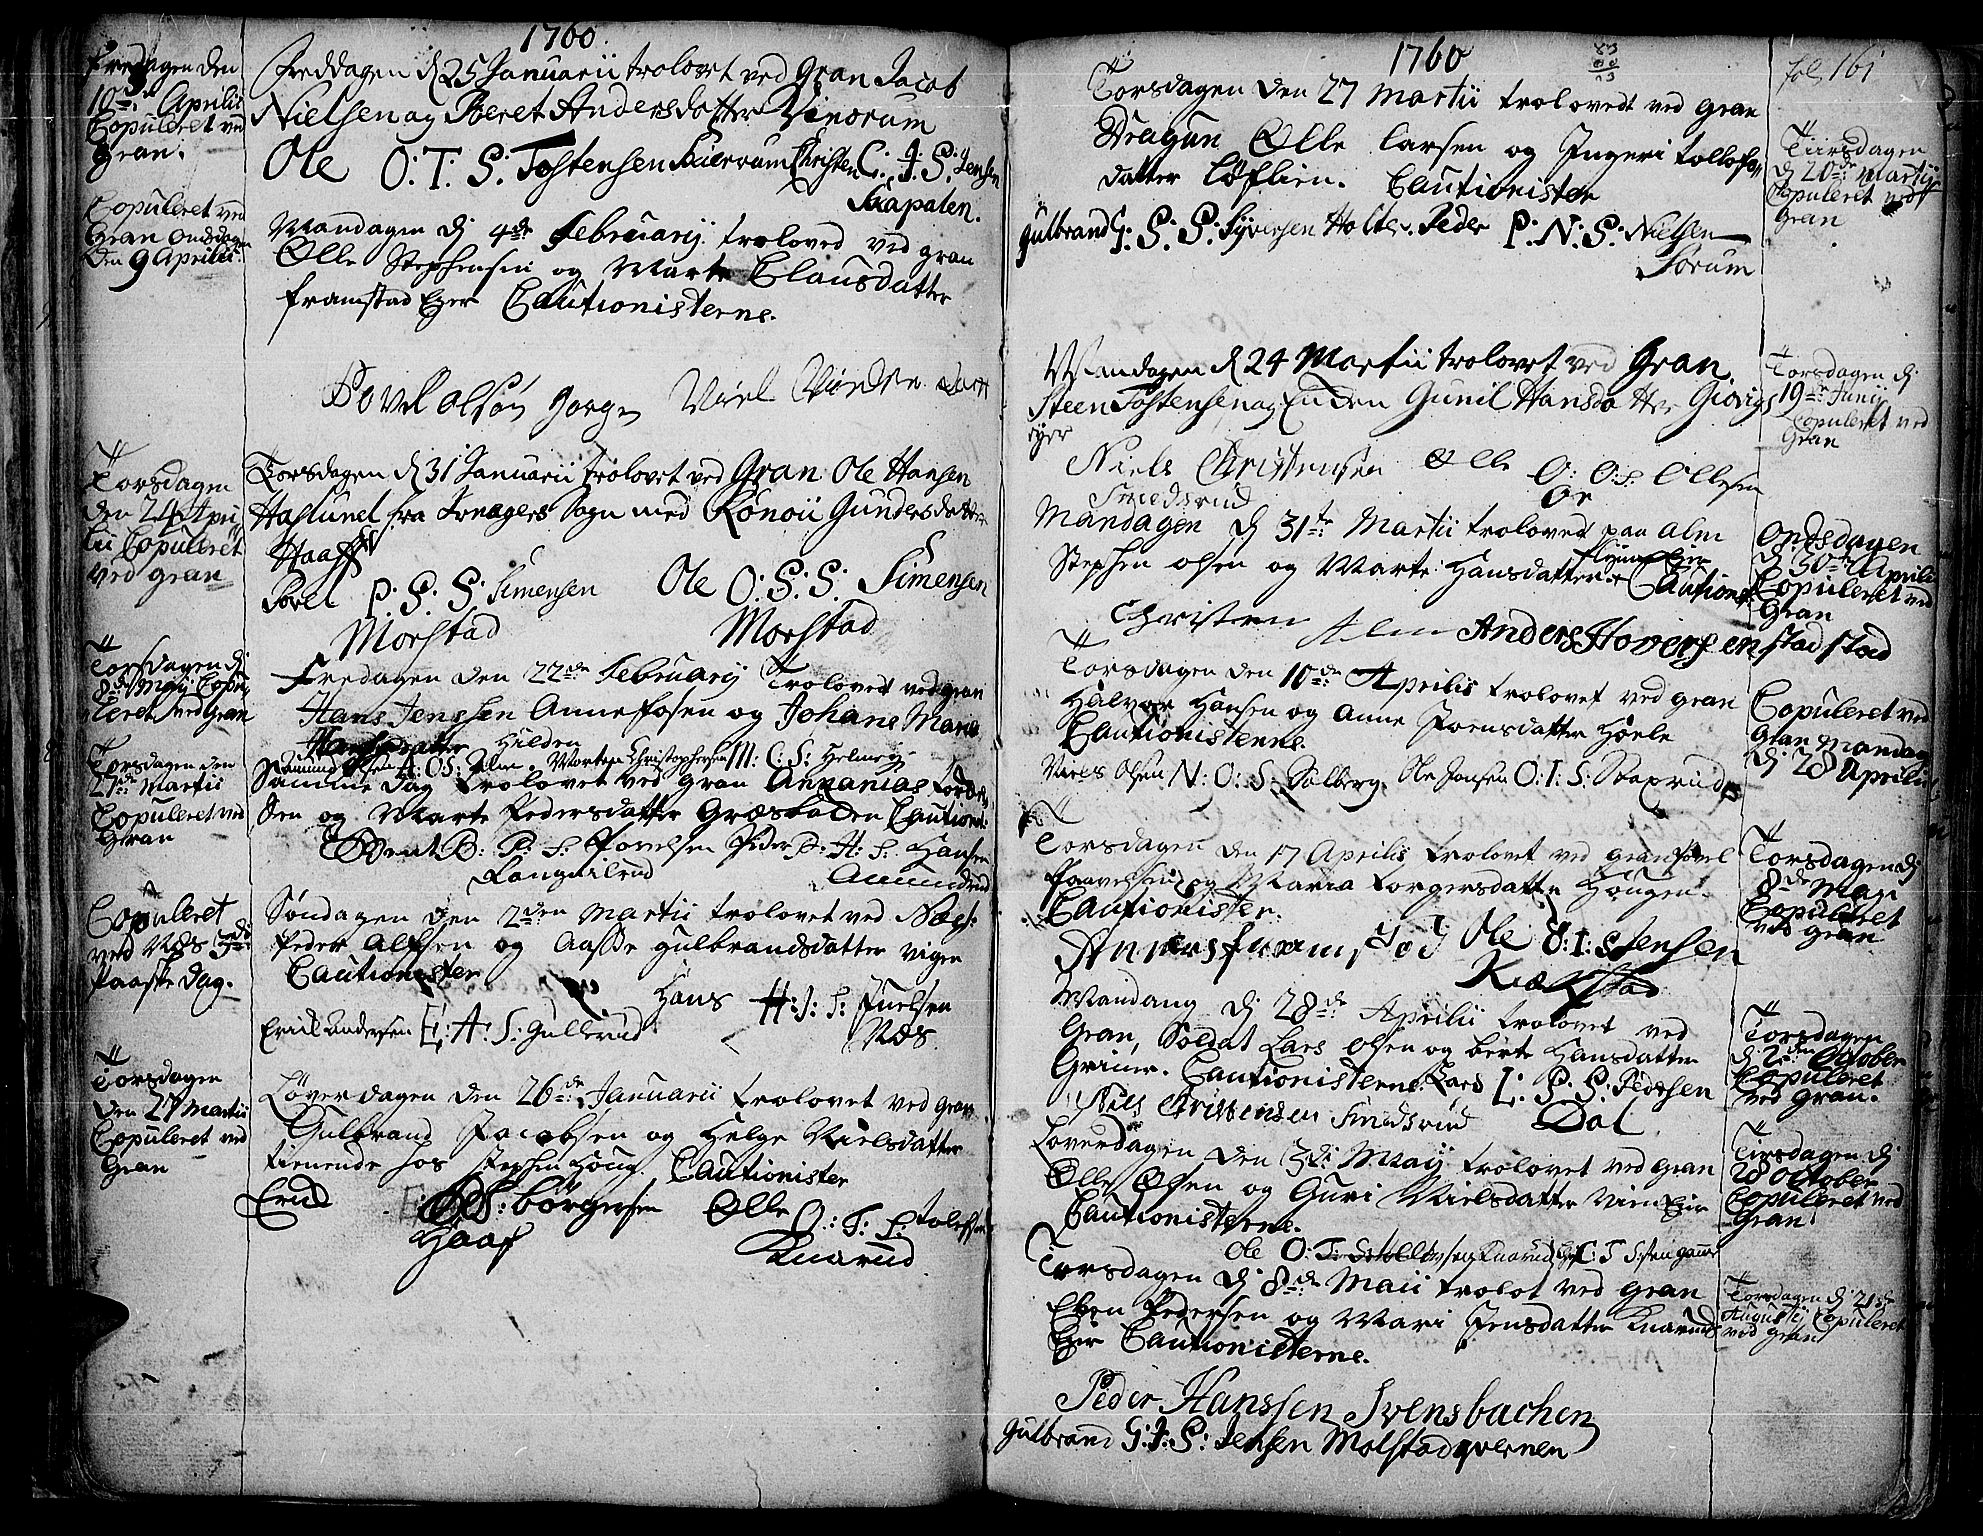 SAH, Gran prestekontor, Ministerialbok nr. 4, 1759-1775, s. 161